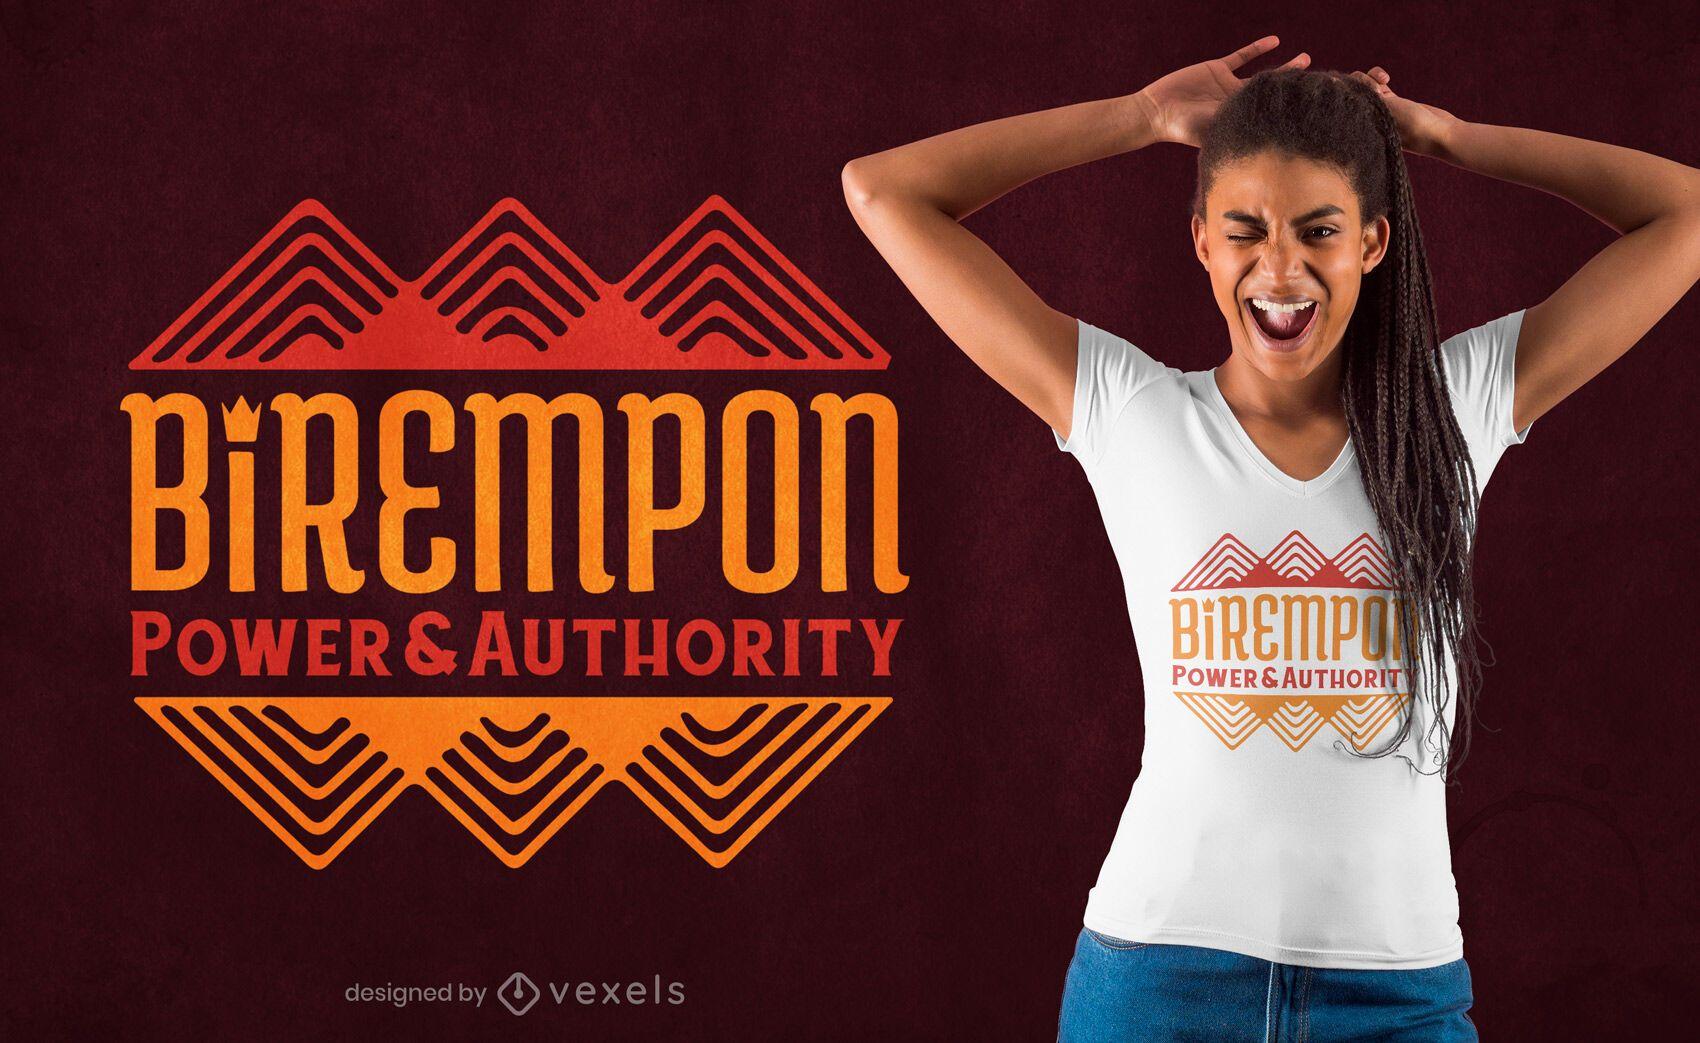 Birempon quote t-shirt design